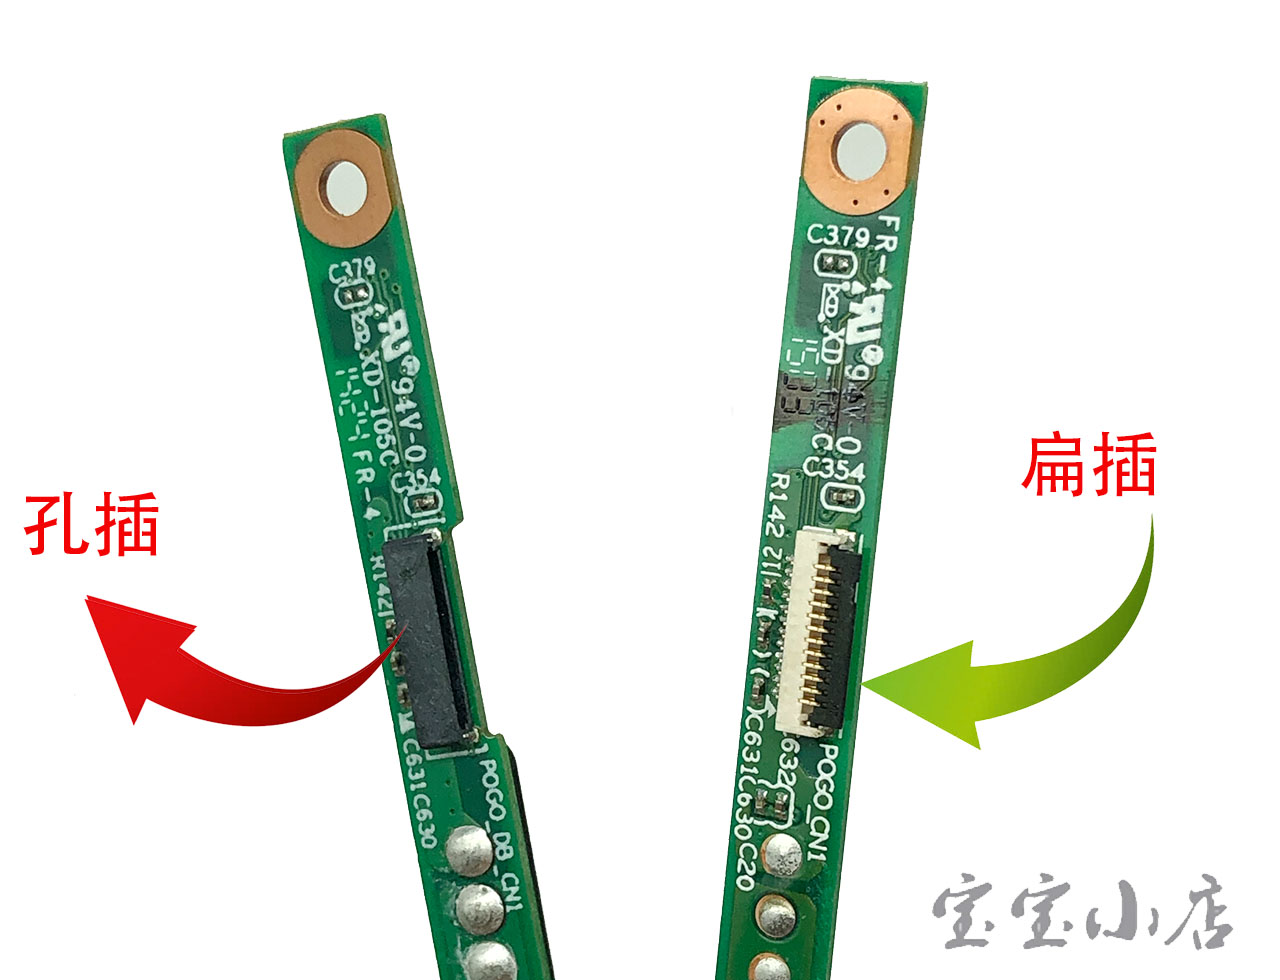 联想Lenovo miix 3-1030 键盘 接口小板 BH5418C V1.2 V1.3